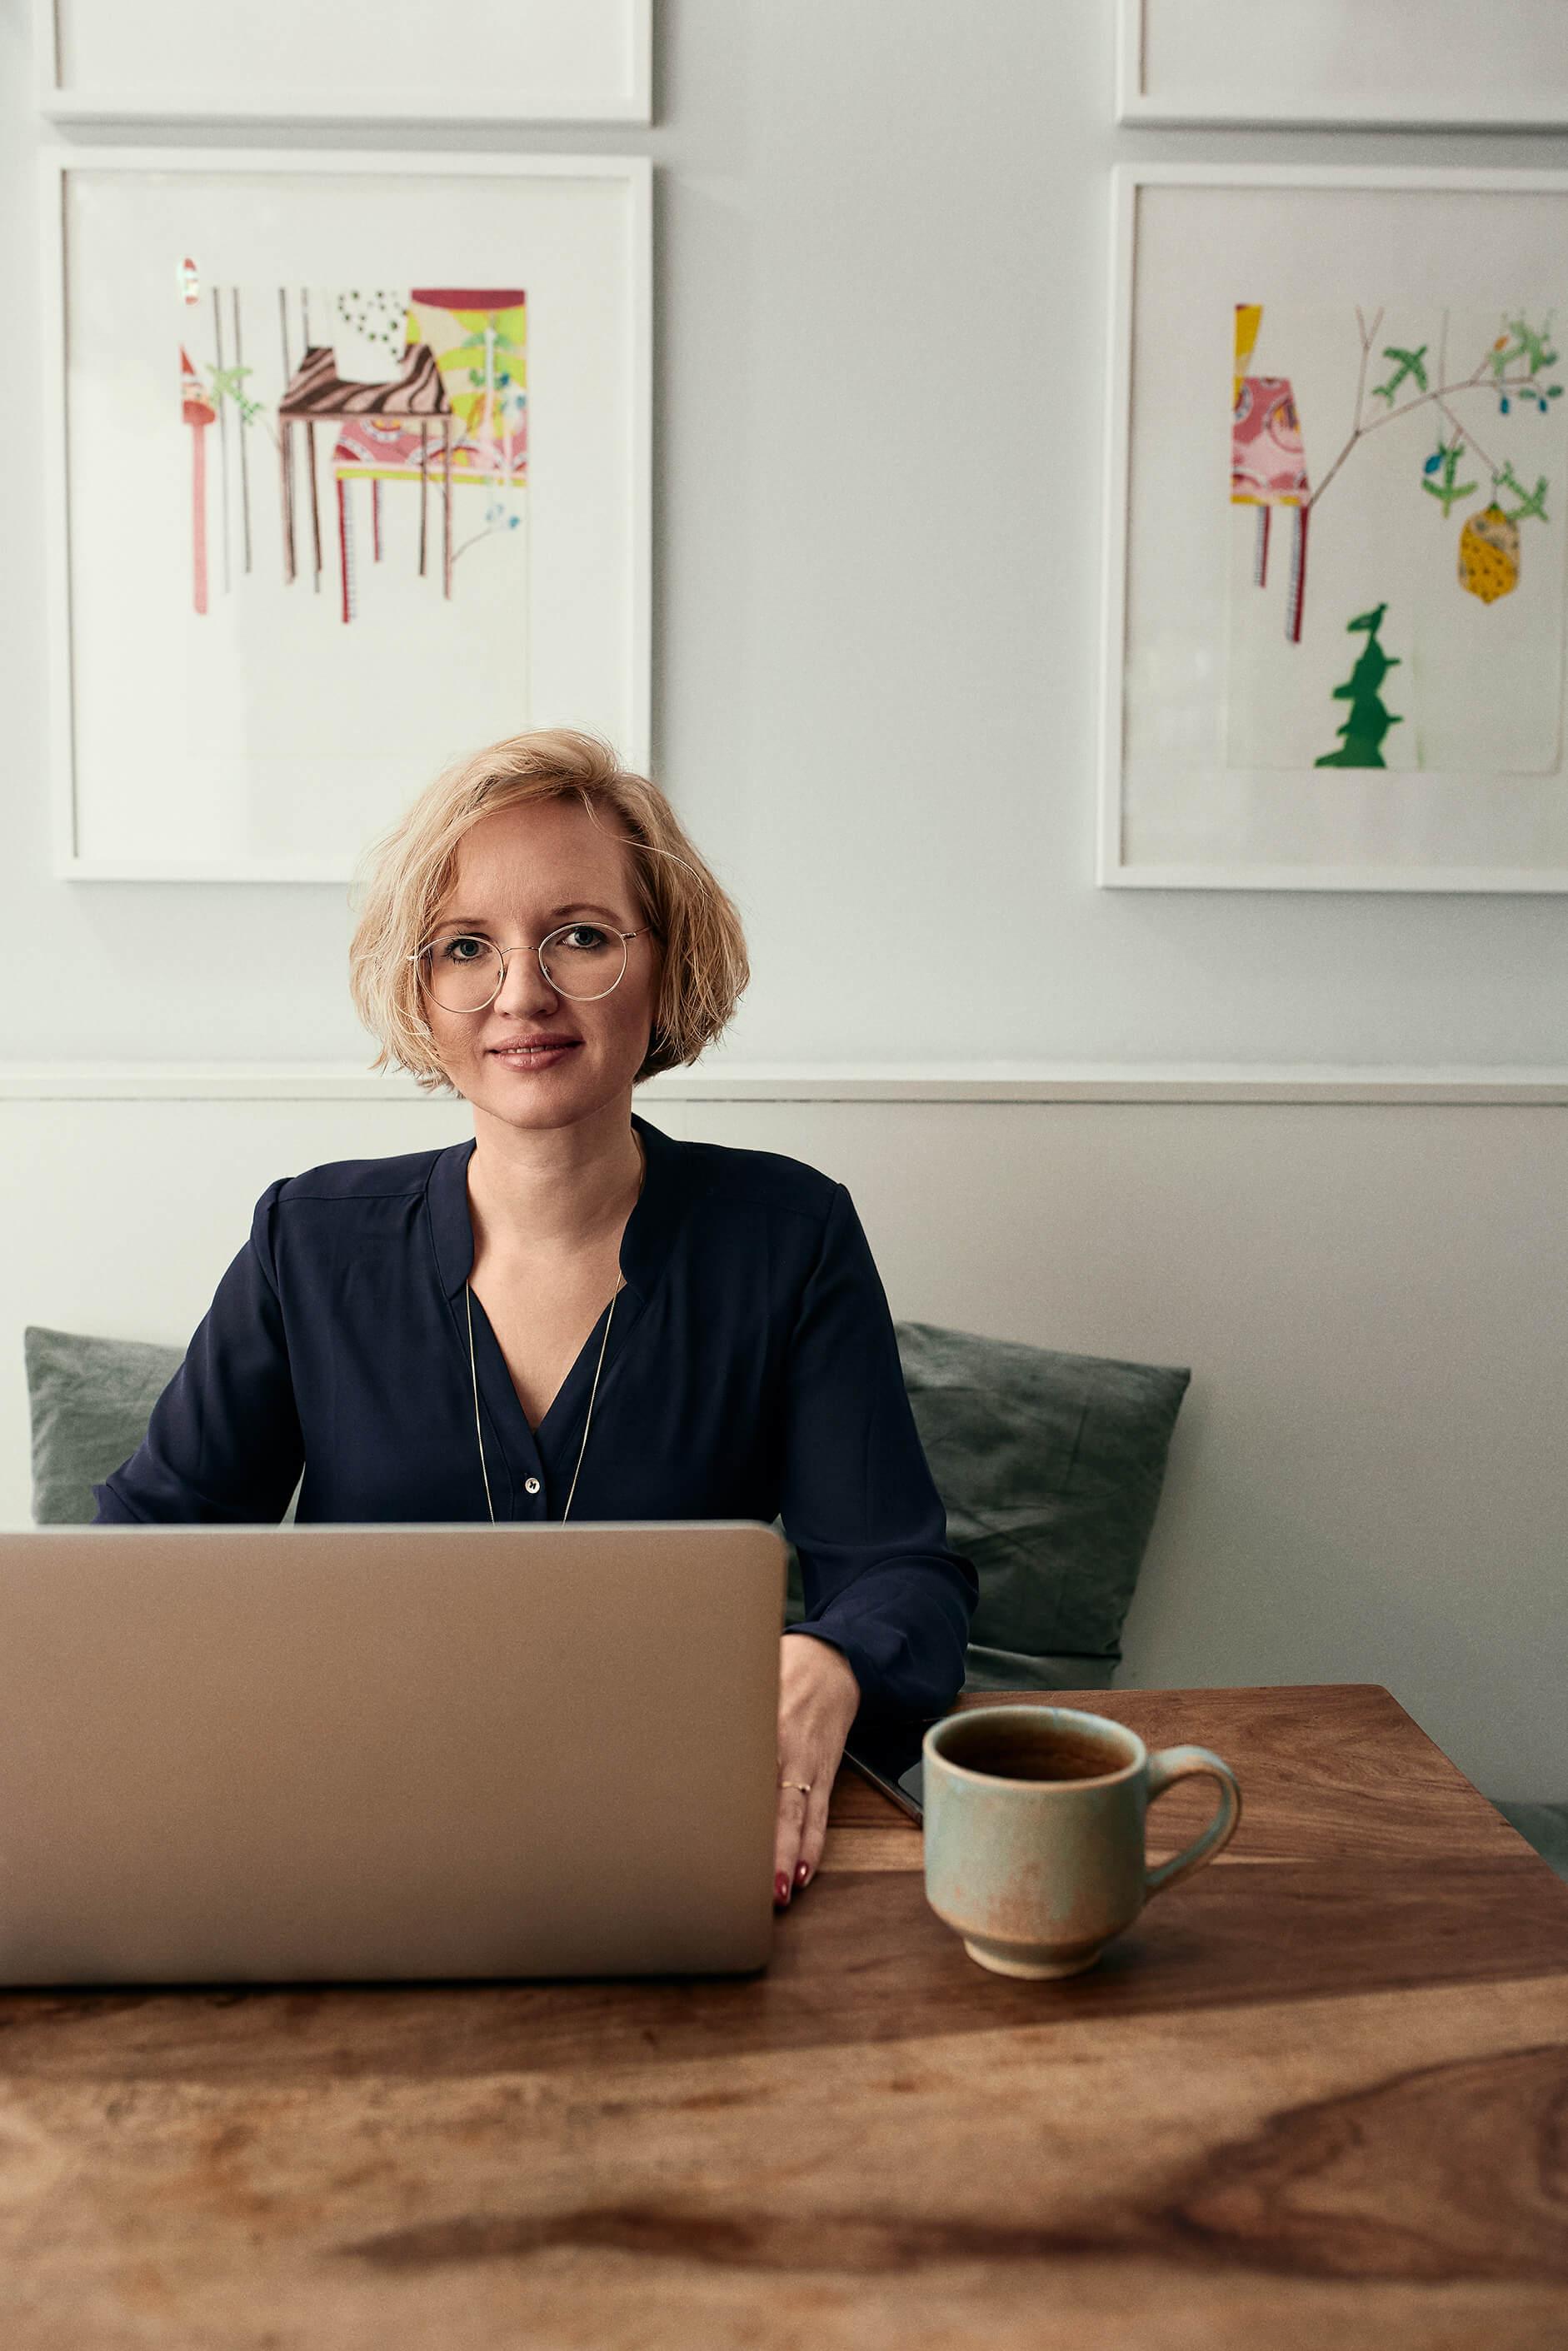 Twostay Coworking Space Munich Alisa Freelancer writer working on laptop